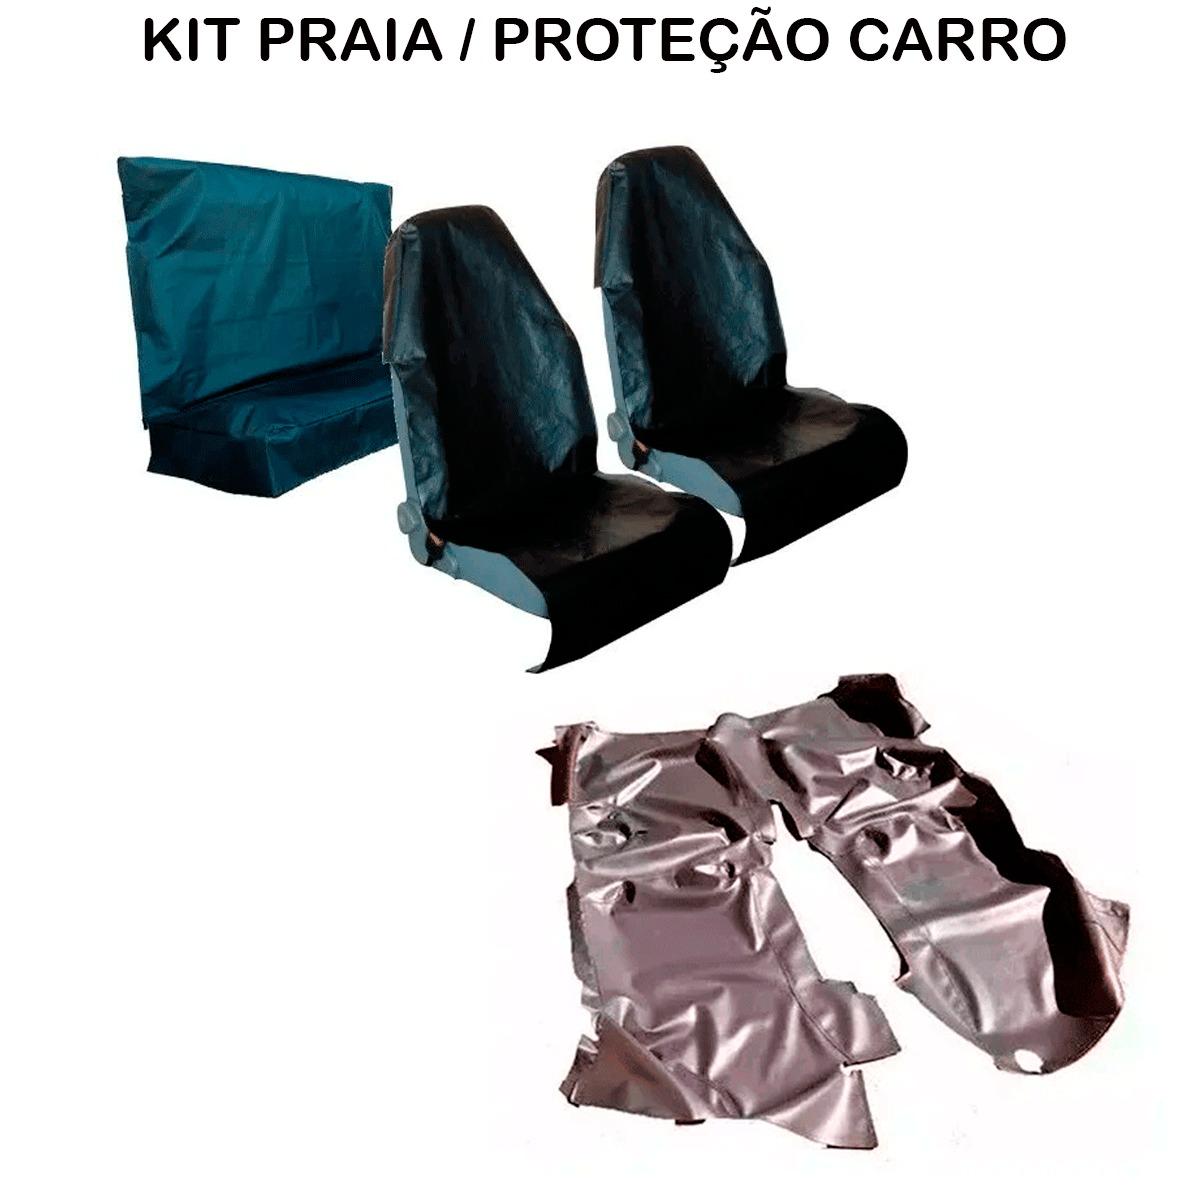 Tapete Em Vinil Fiat Grand Siena + Capa Banco Protecao Banco Areia Suor Academia